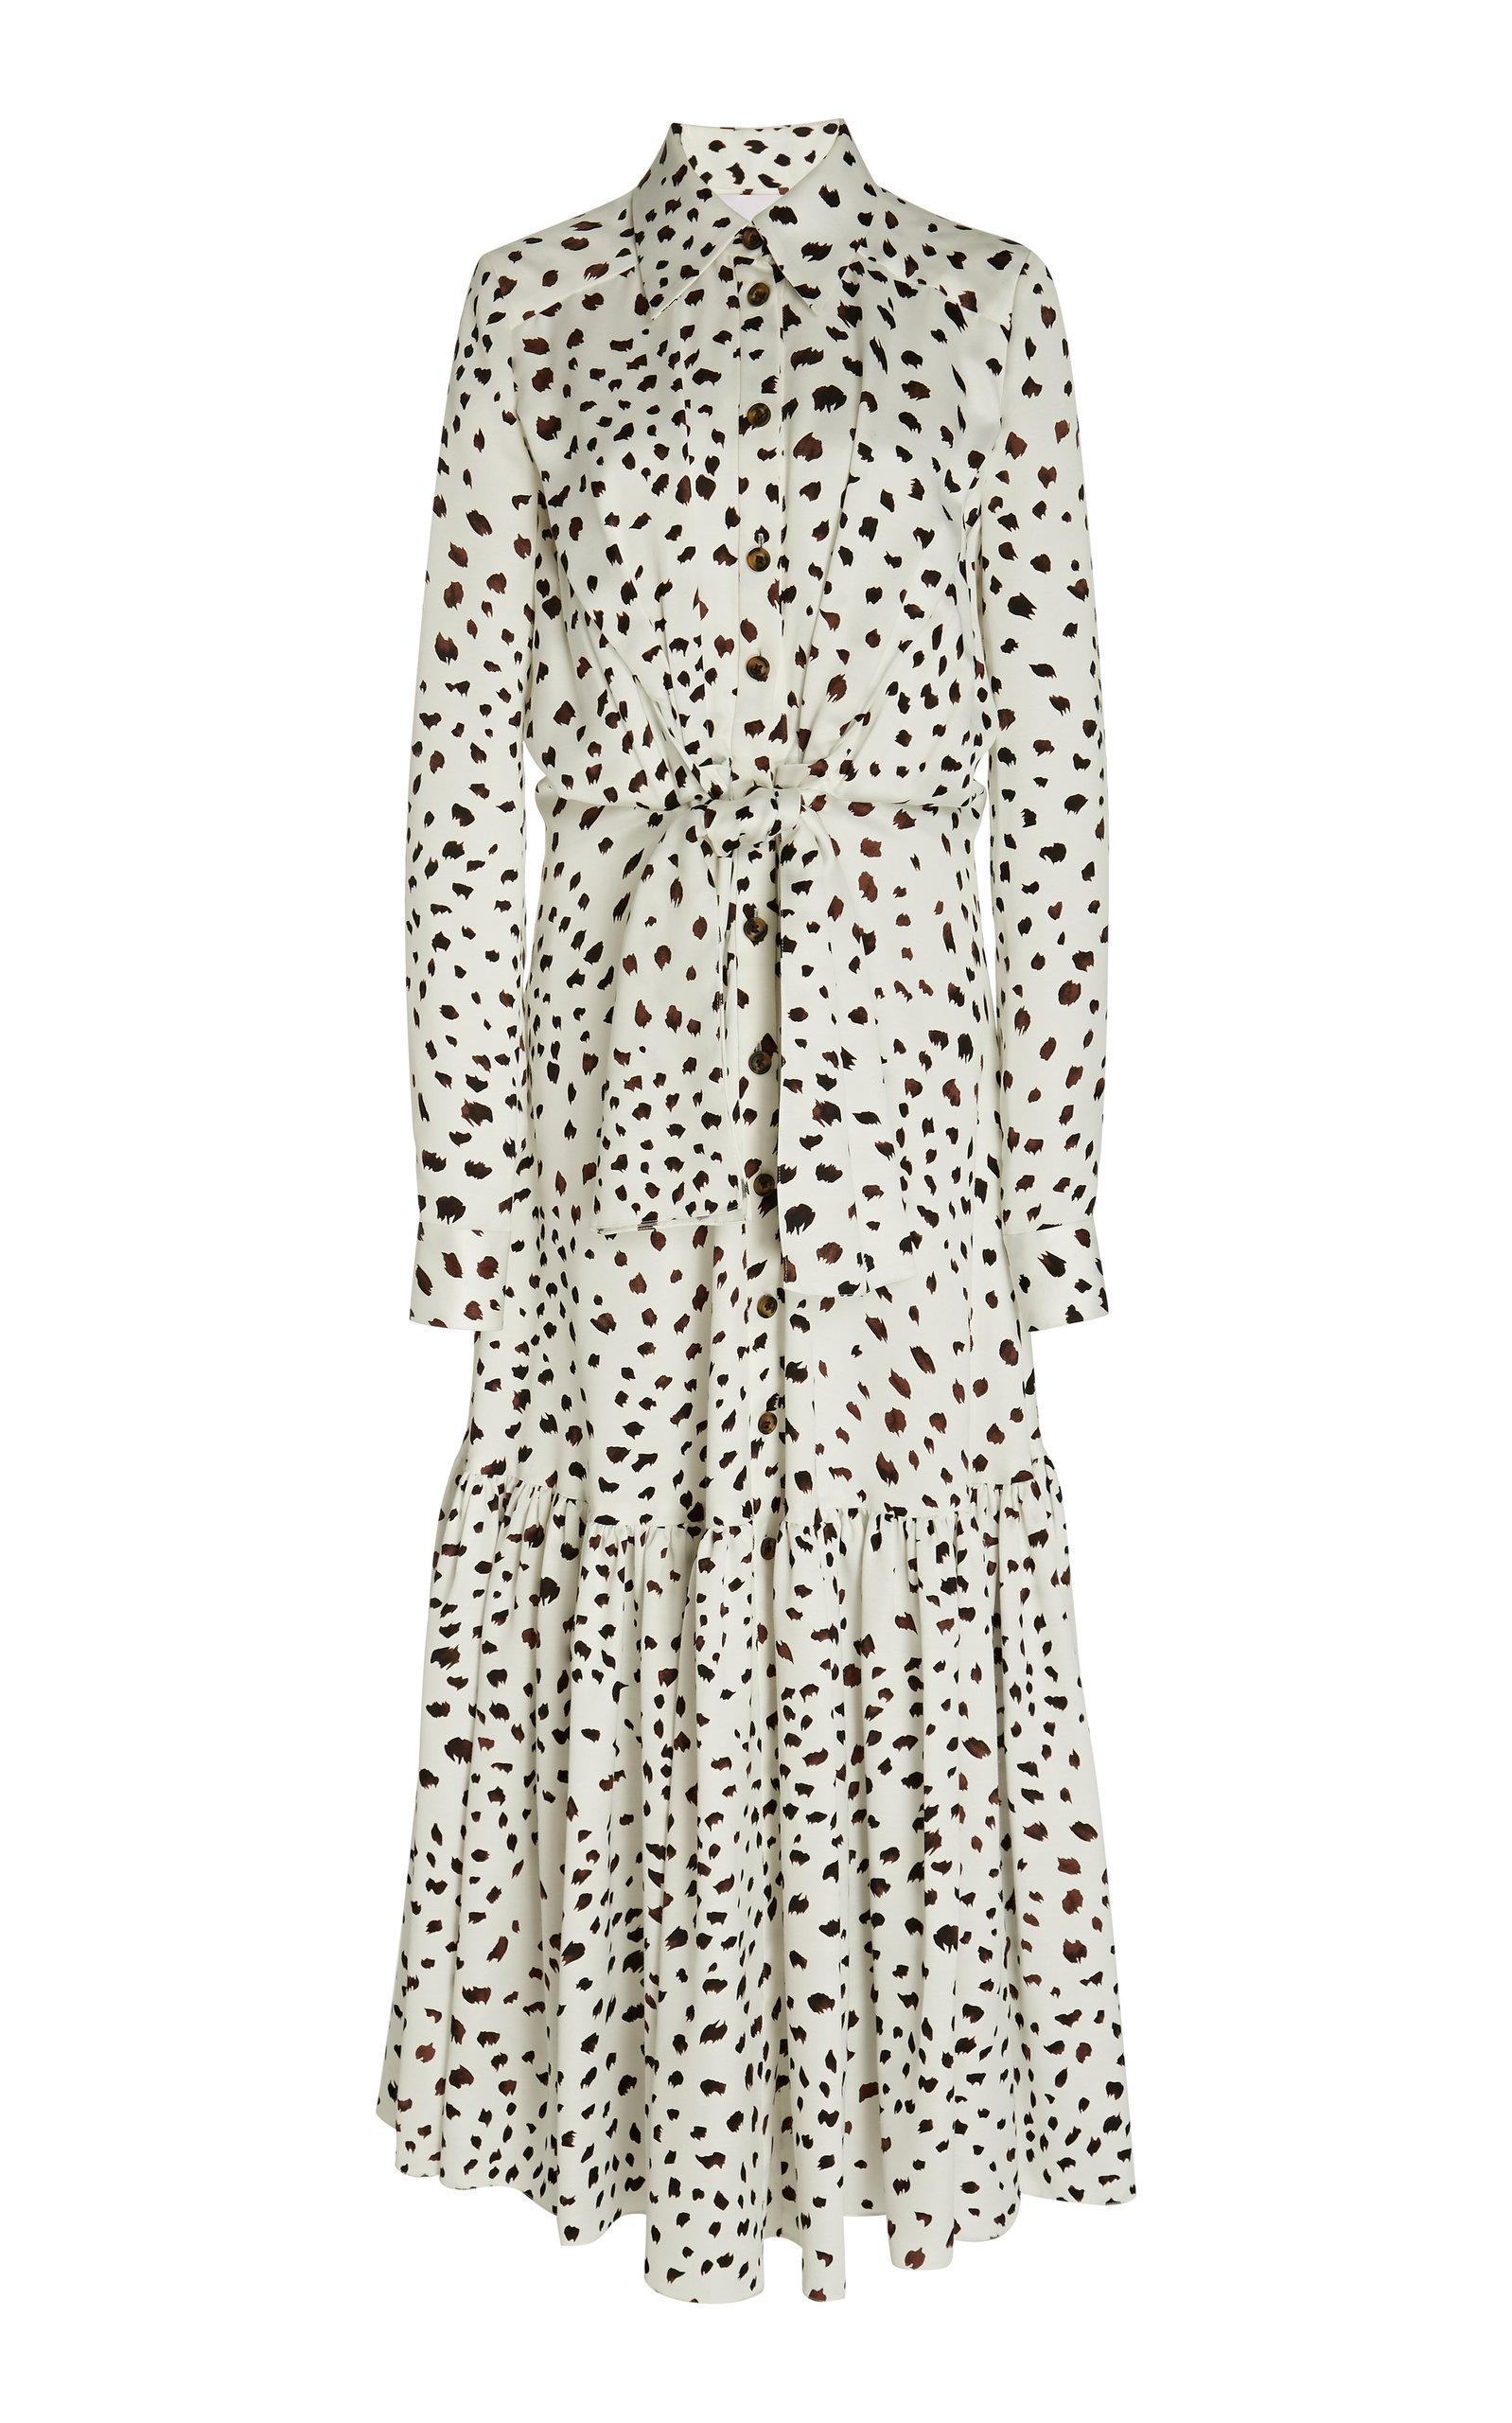 8a5756614e Carolina HerreraPrinted And Belted Satin Maxi Shirt Dress. CLOSE. Loading